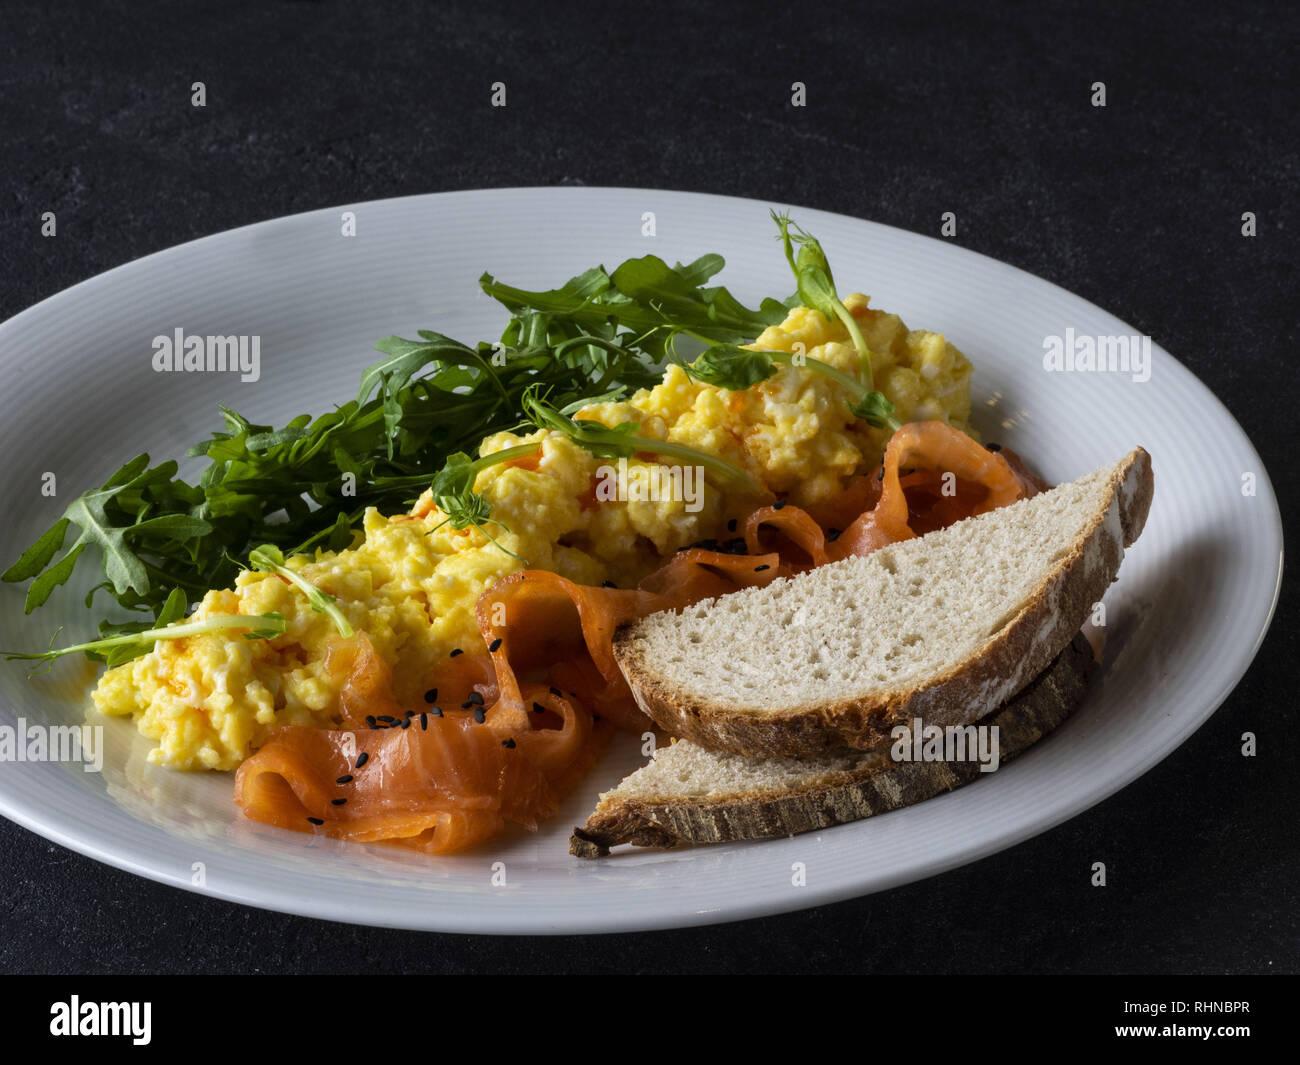 Kiev, Ukraine. 28th Jan, 2019. Scramble with salmon and arugula seen served on a plate. Credit: Igor Golovniov/SOPA Images/ZUMA Wire/Alamy Live News - Stock Image